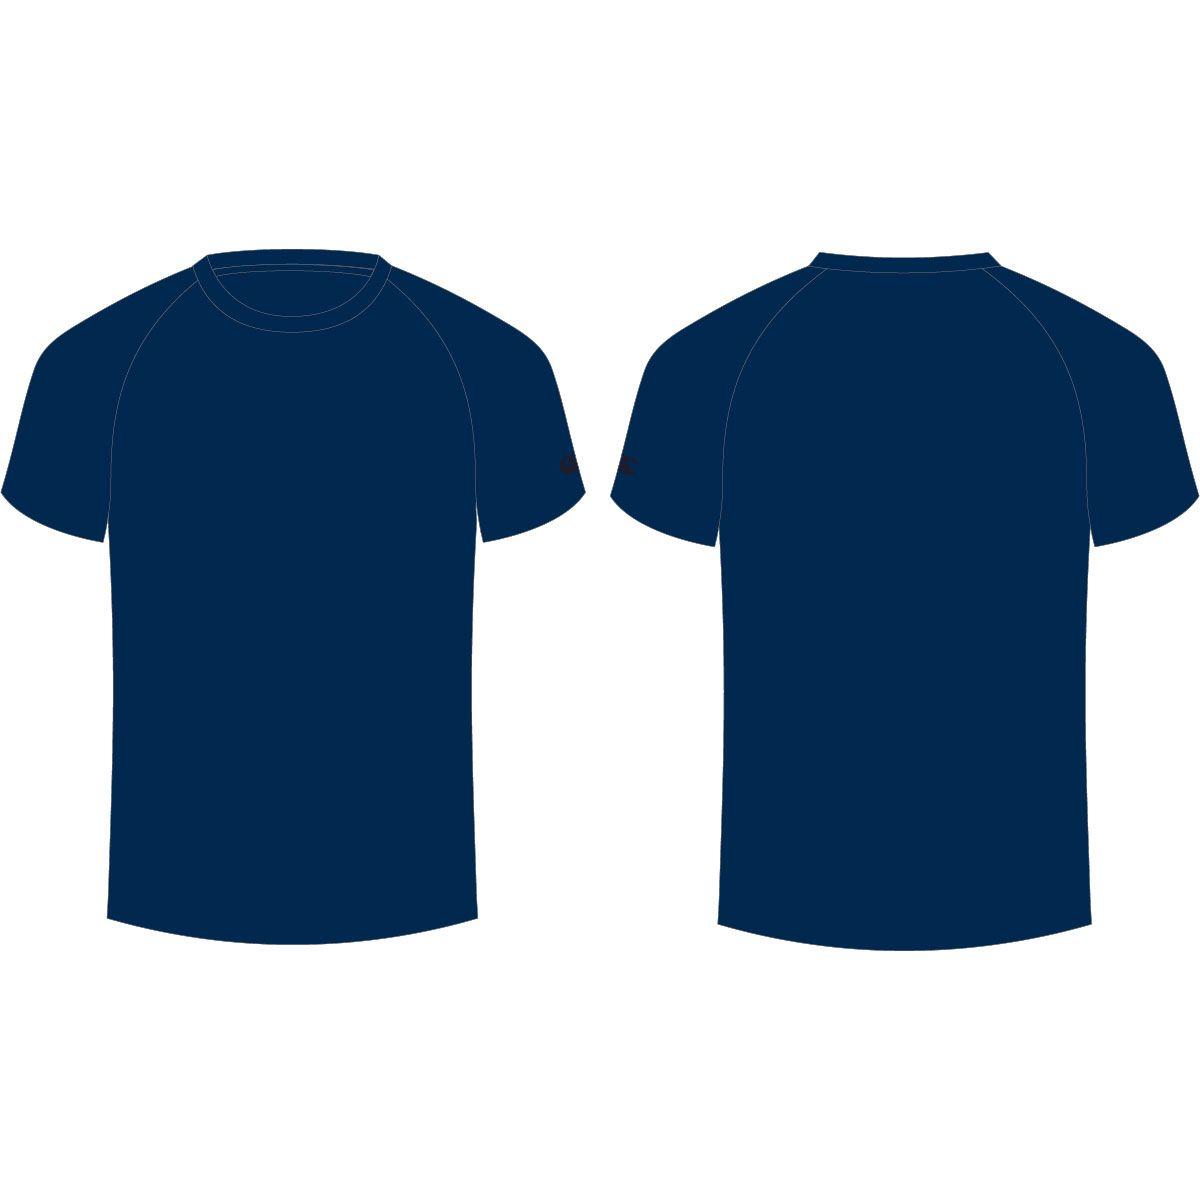 Navy Blue T Shirt Shirt Template Blue Tshirt